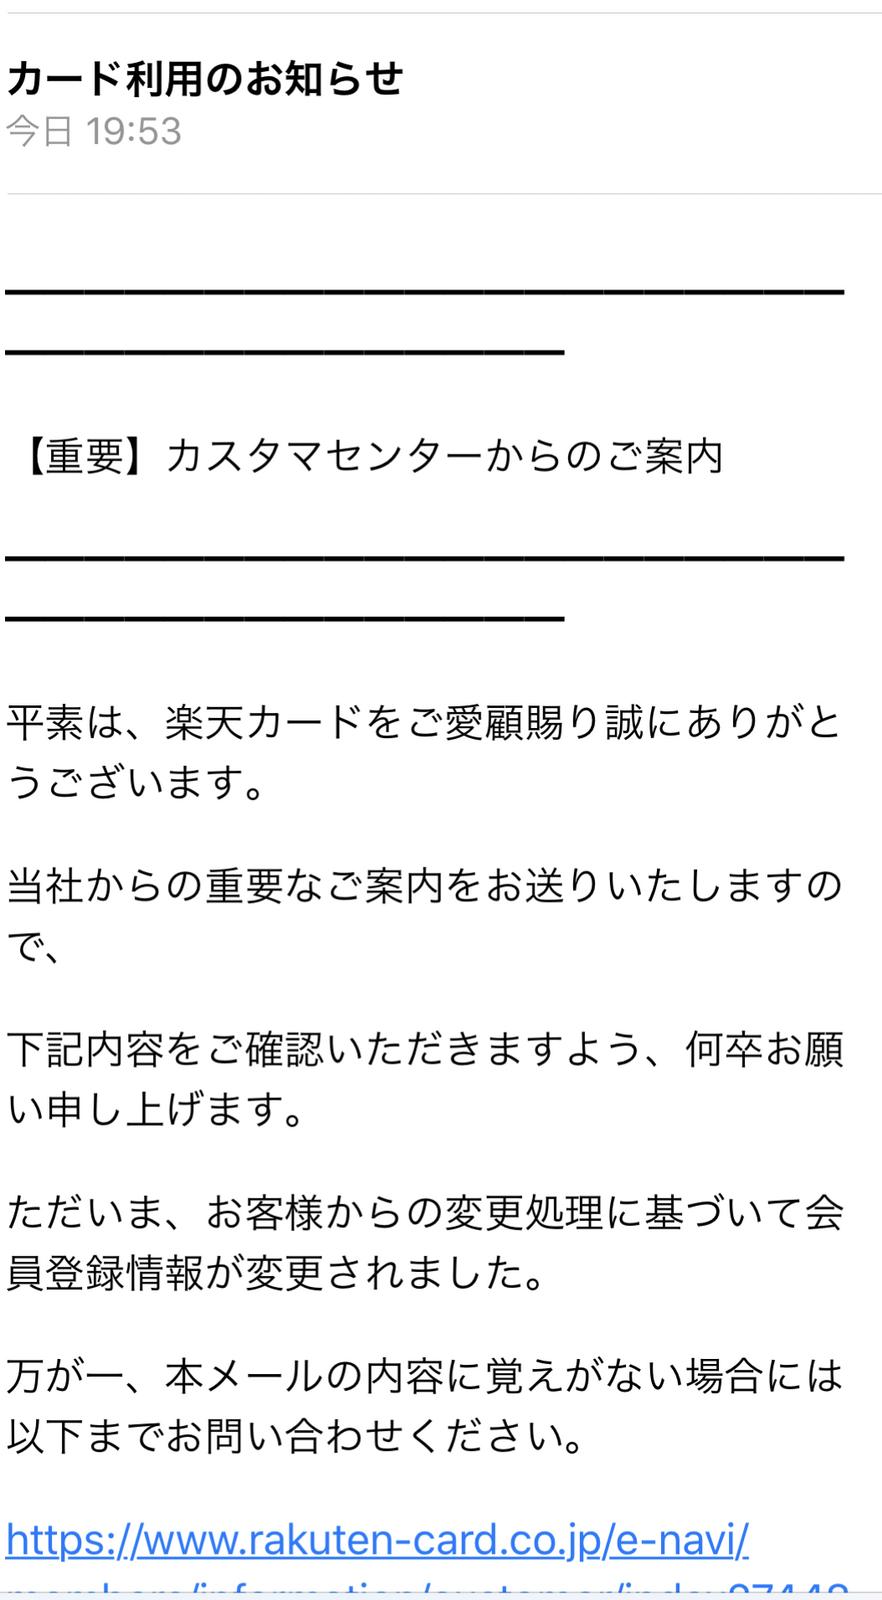 20171213_213046_2